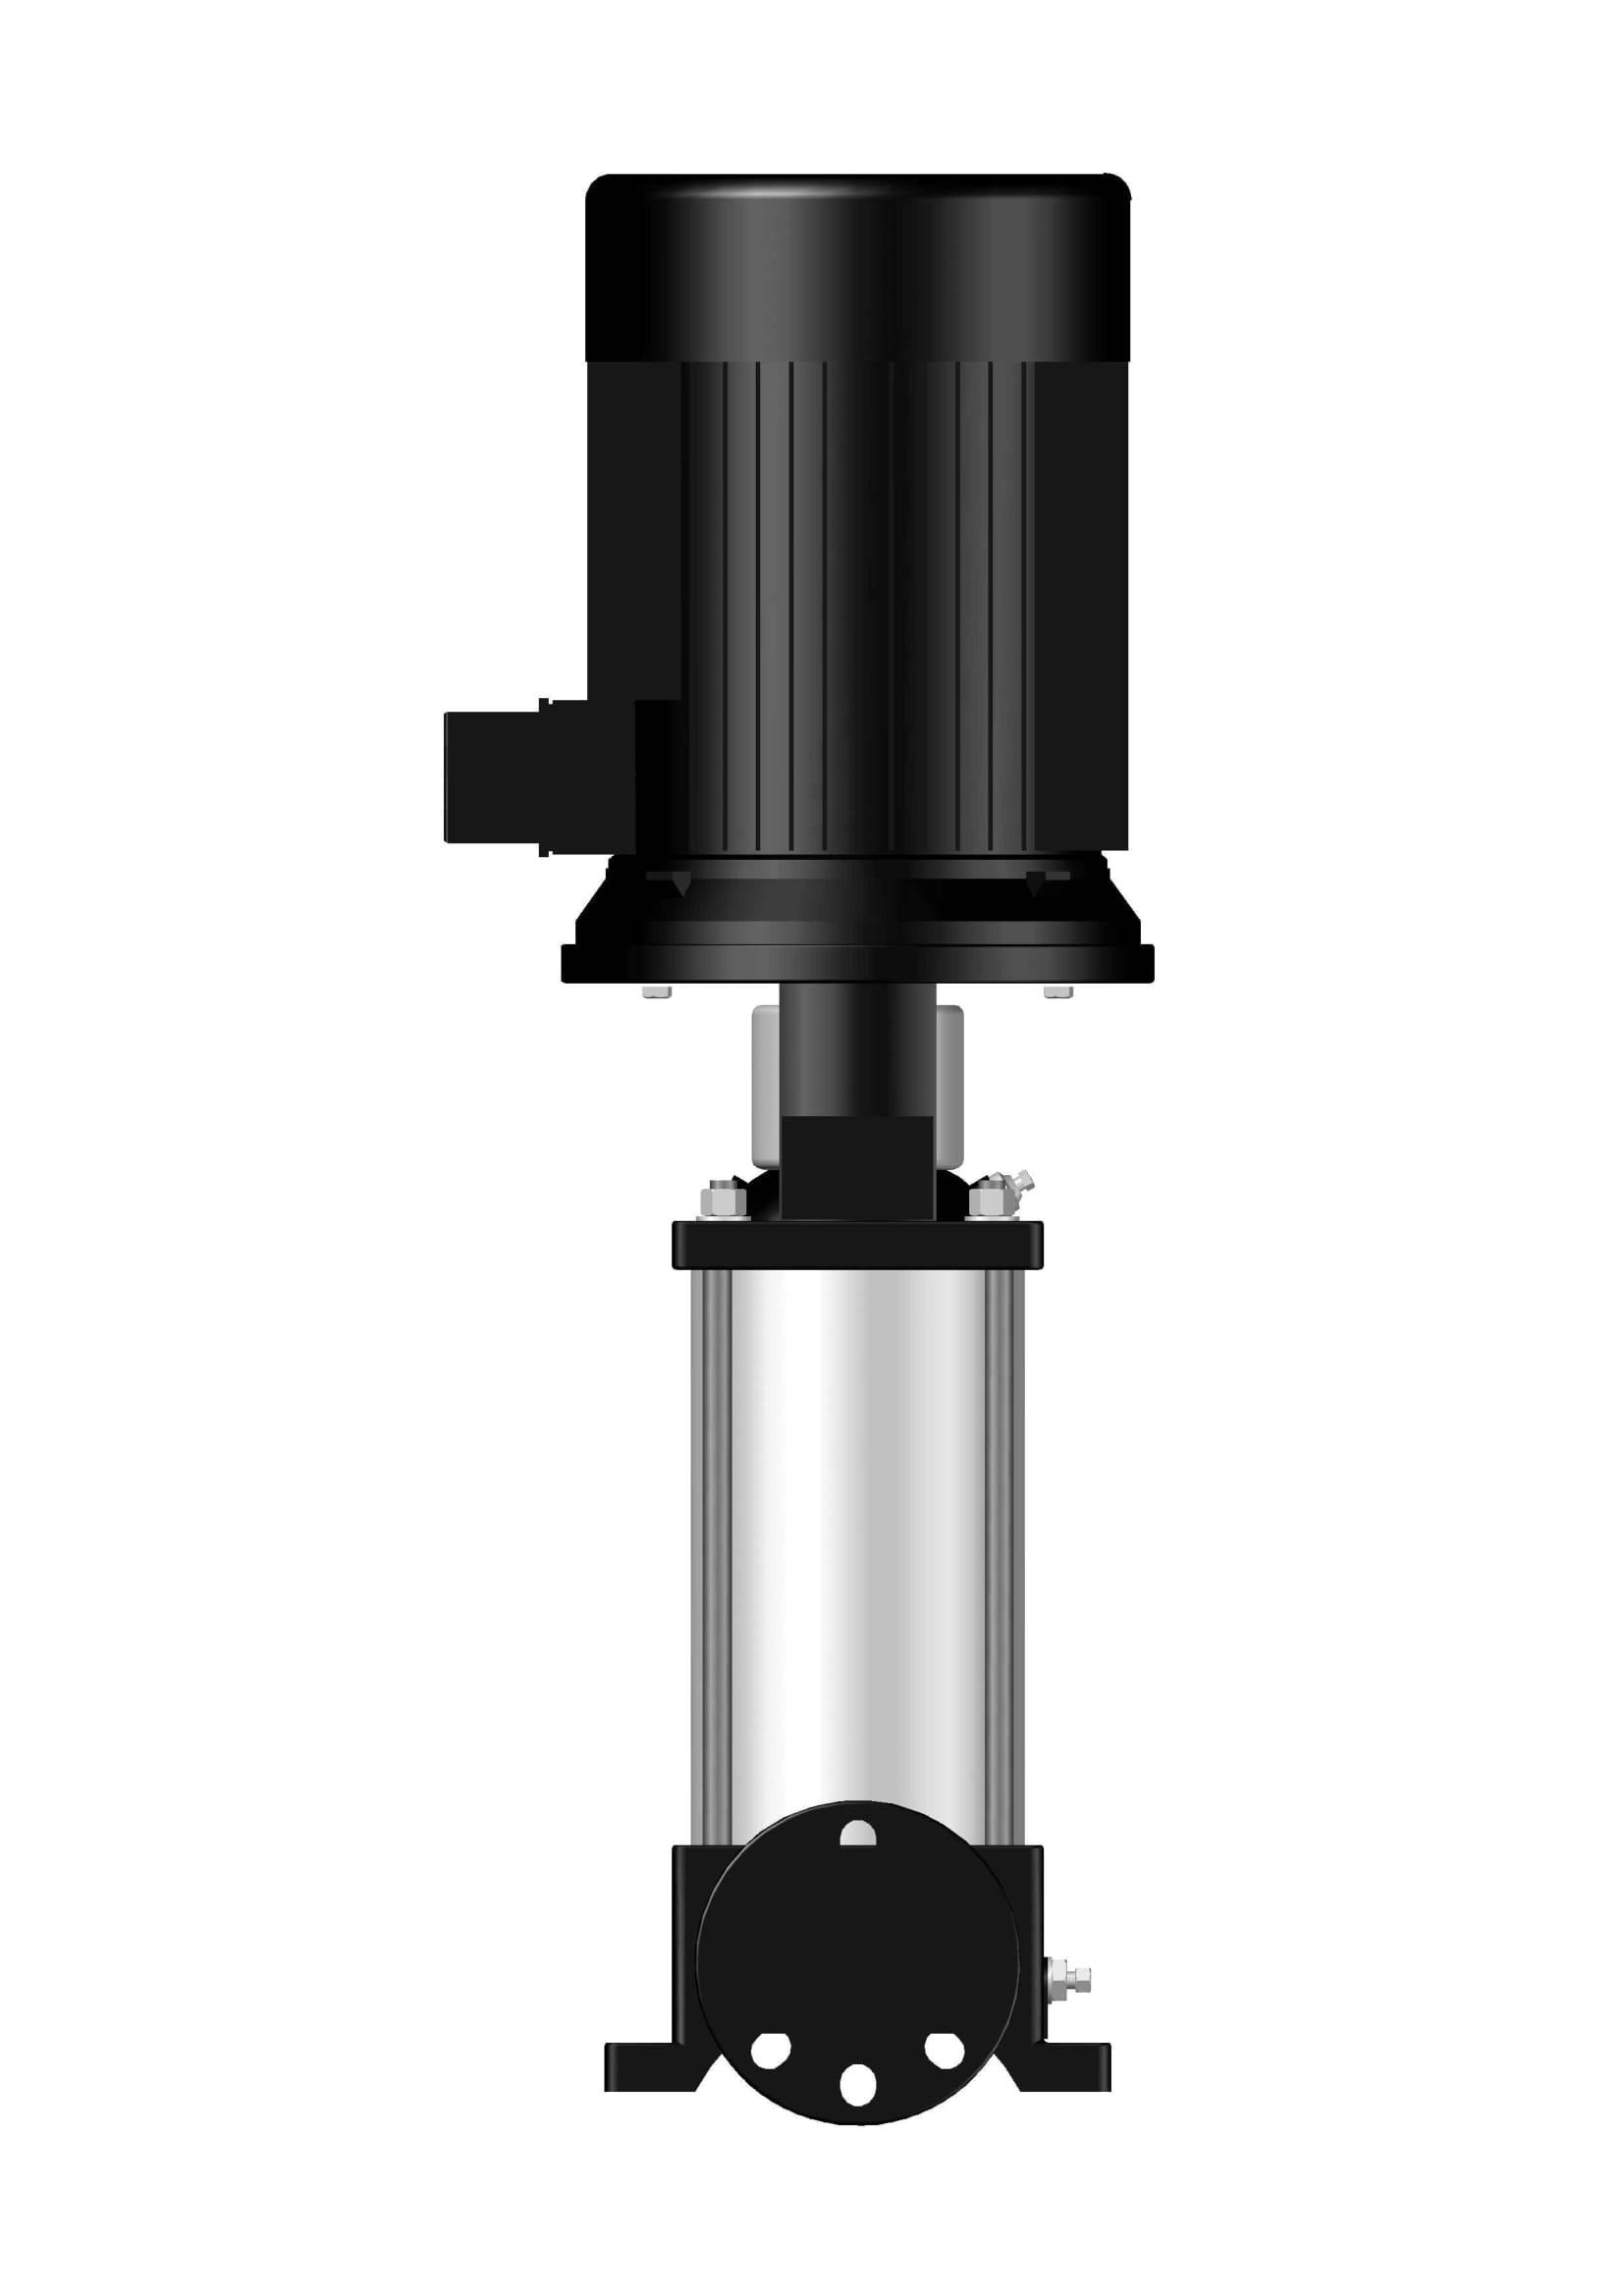 BV 15-06